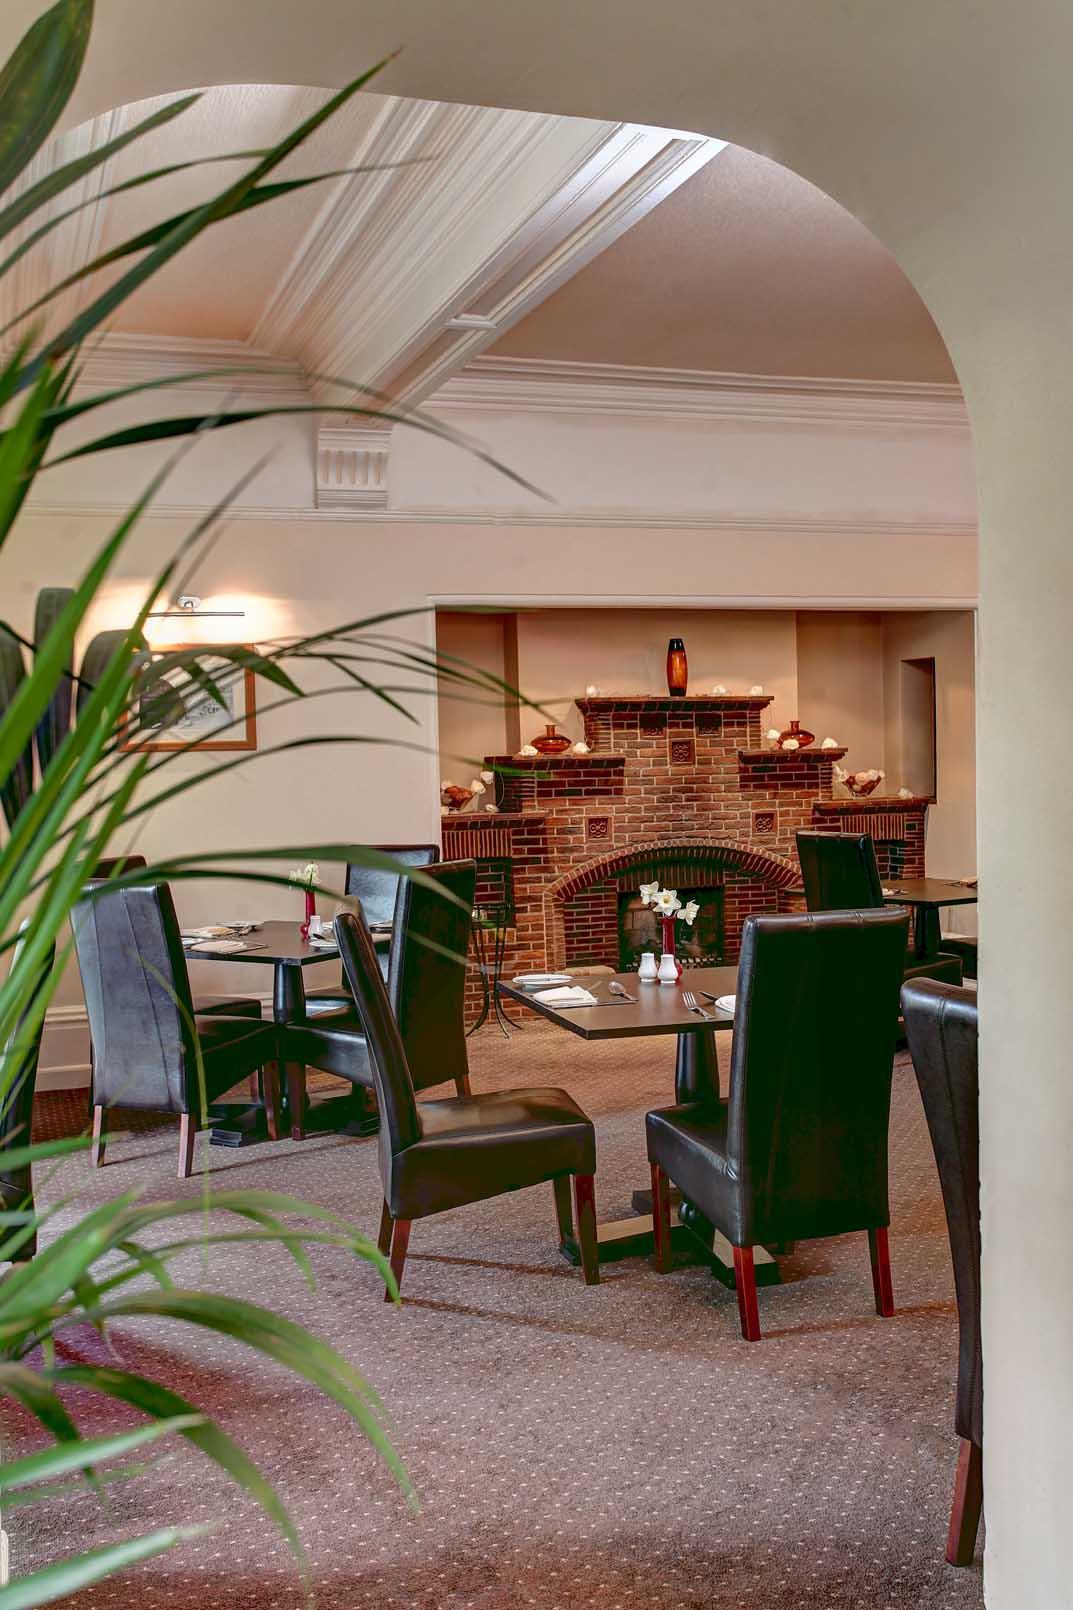 Best Western Hotel Room: Best Western Manchester Bury Bolholt Country Park Hotel